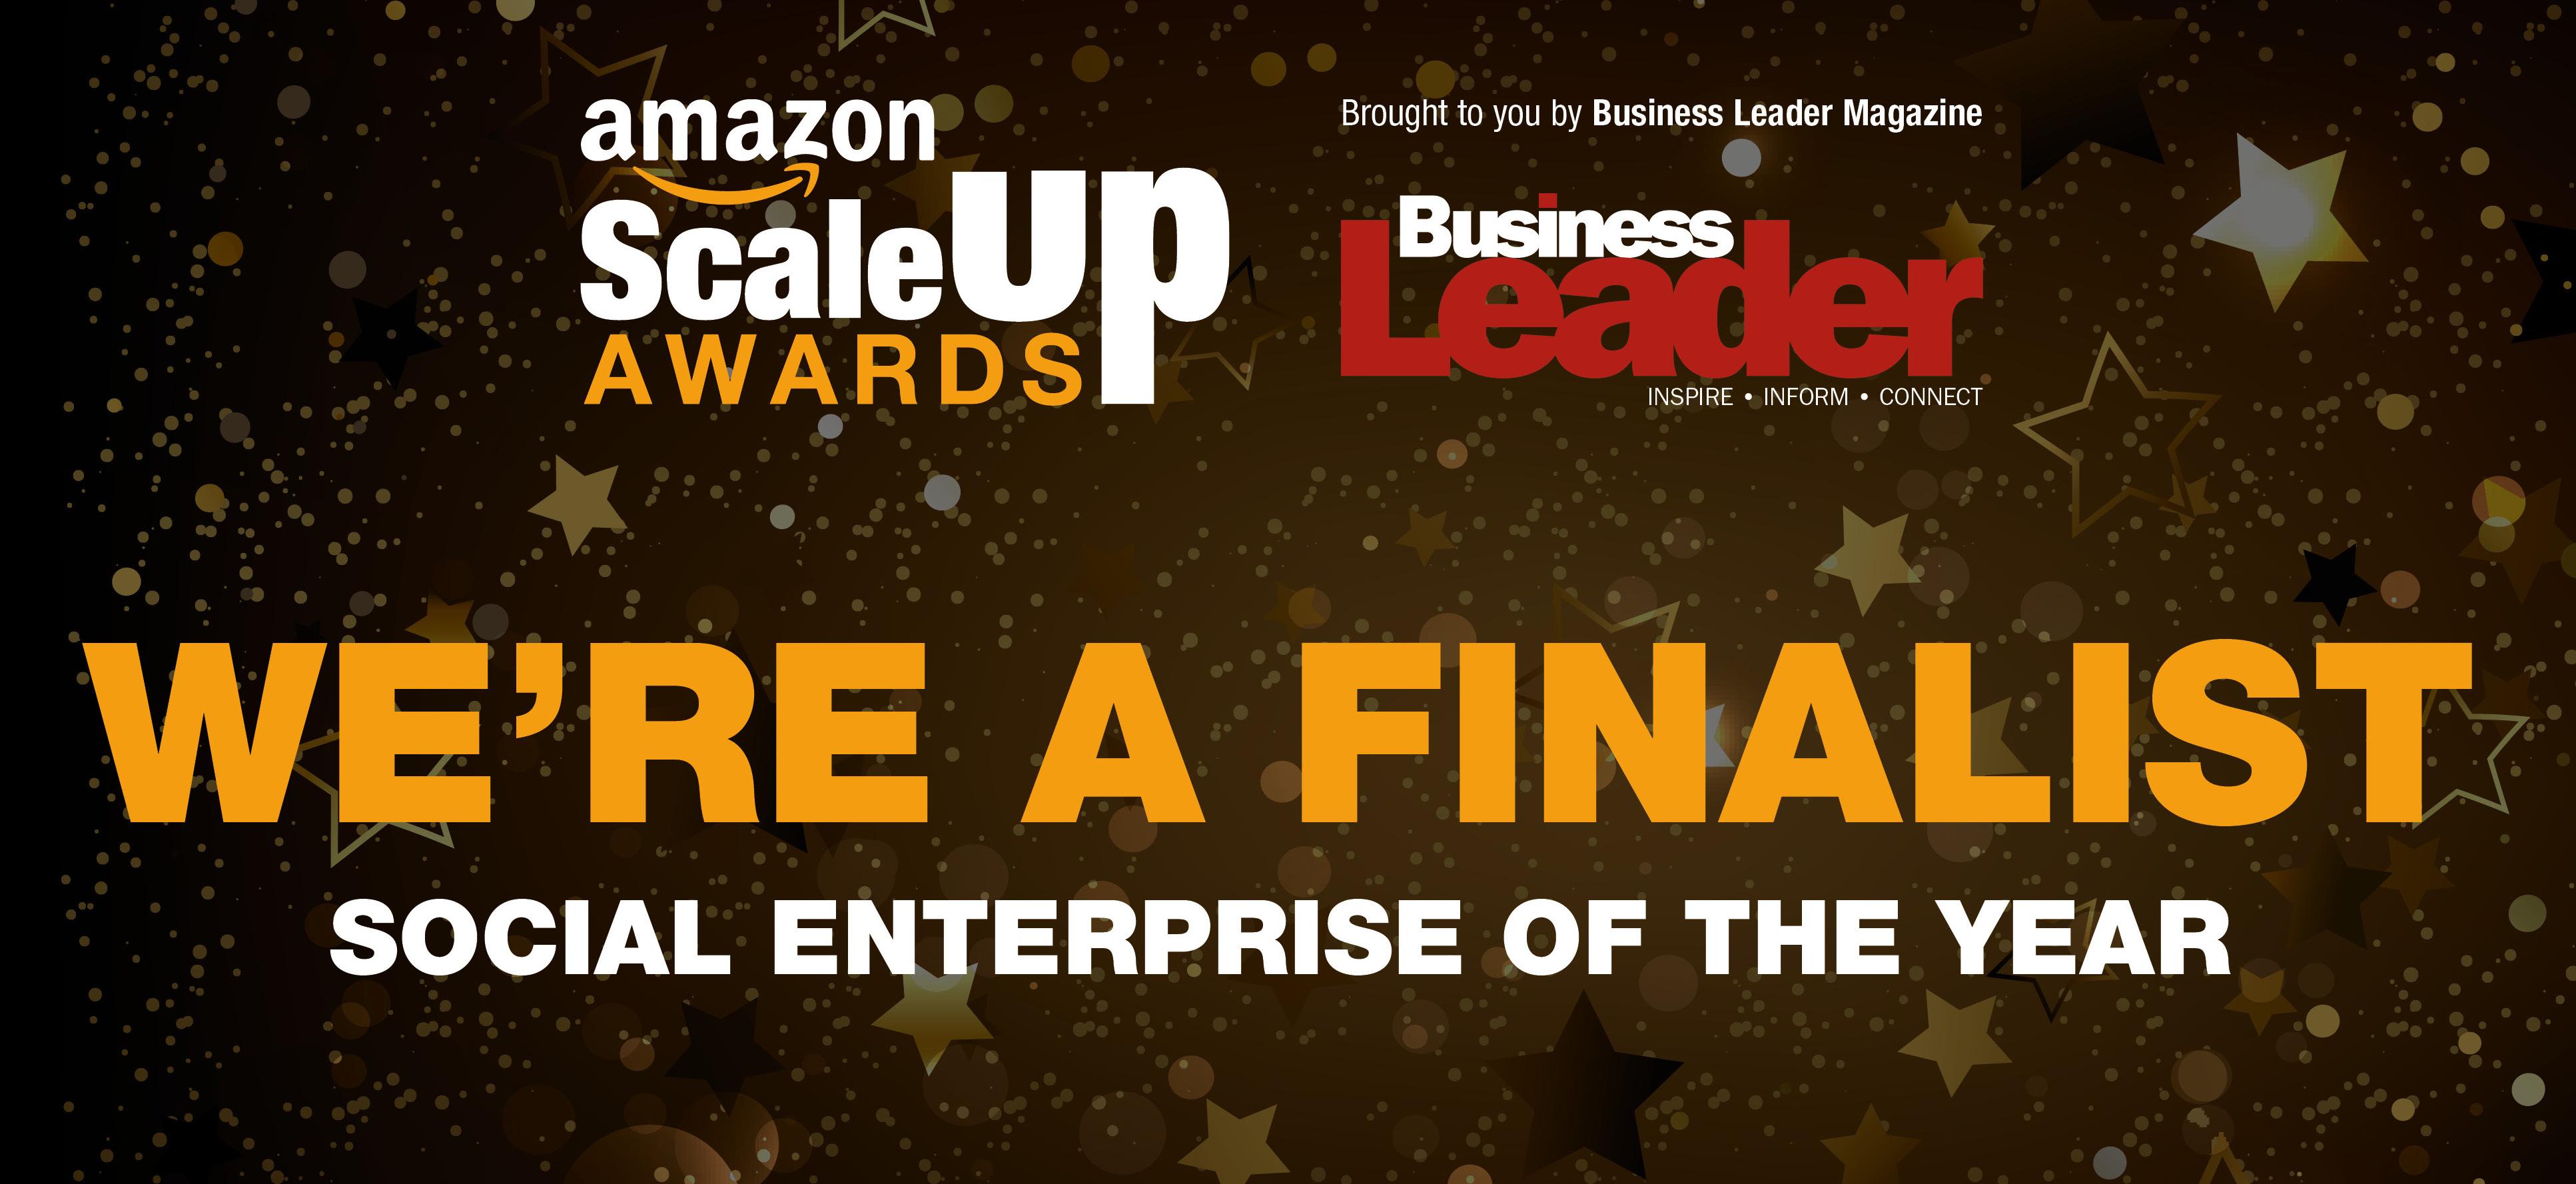 Jan 2020 (Bl) ScaleUp Awards Finalist Social Card (LinkedIn)